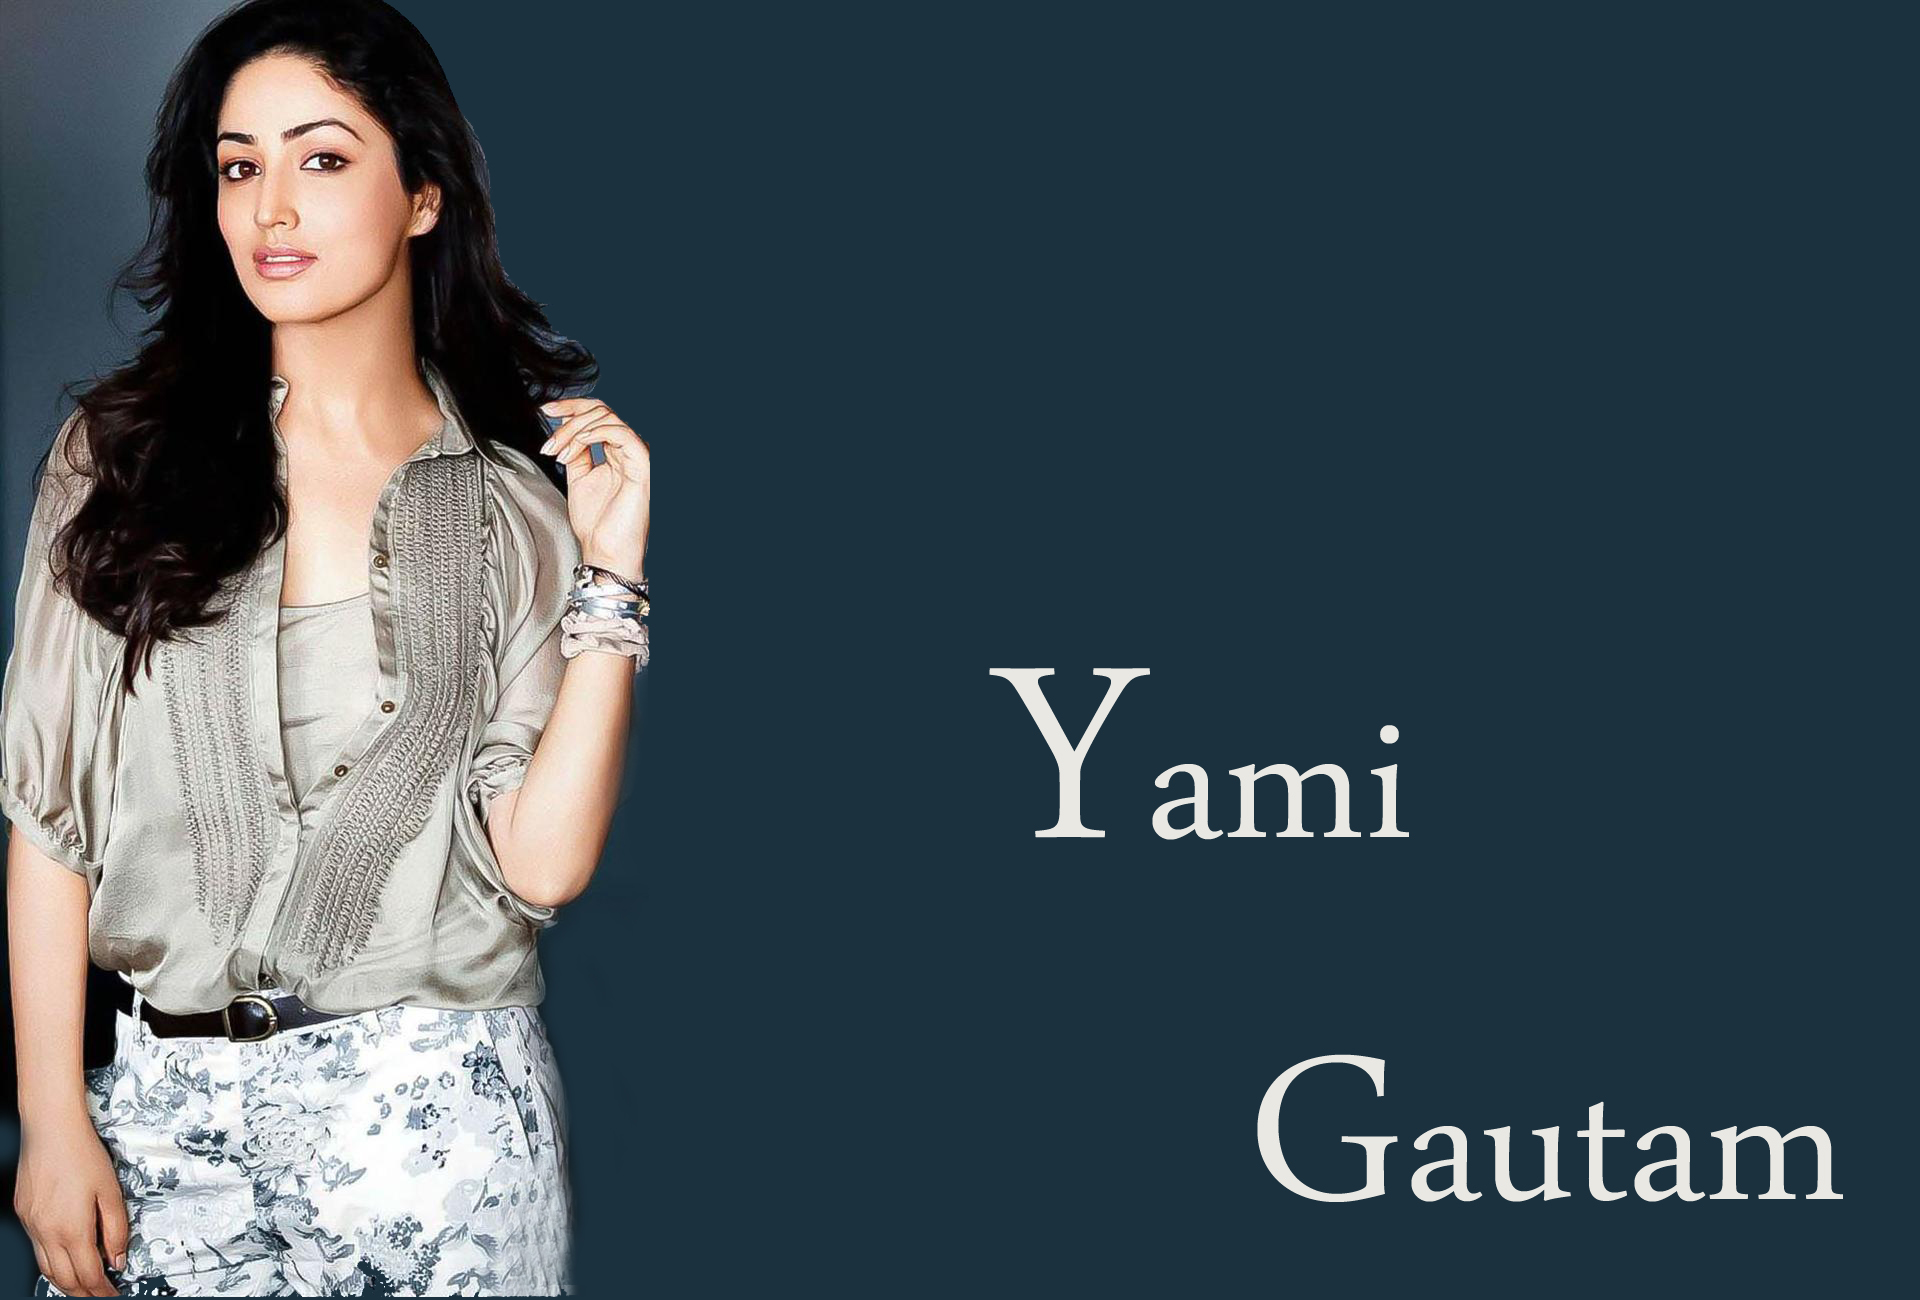 Yami Gautam Hd Pics: Yami Gautam Sexy Photos And Wallpaper In Bikini